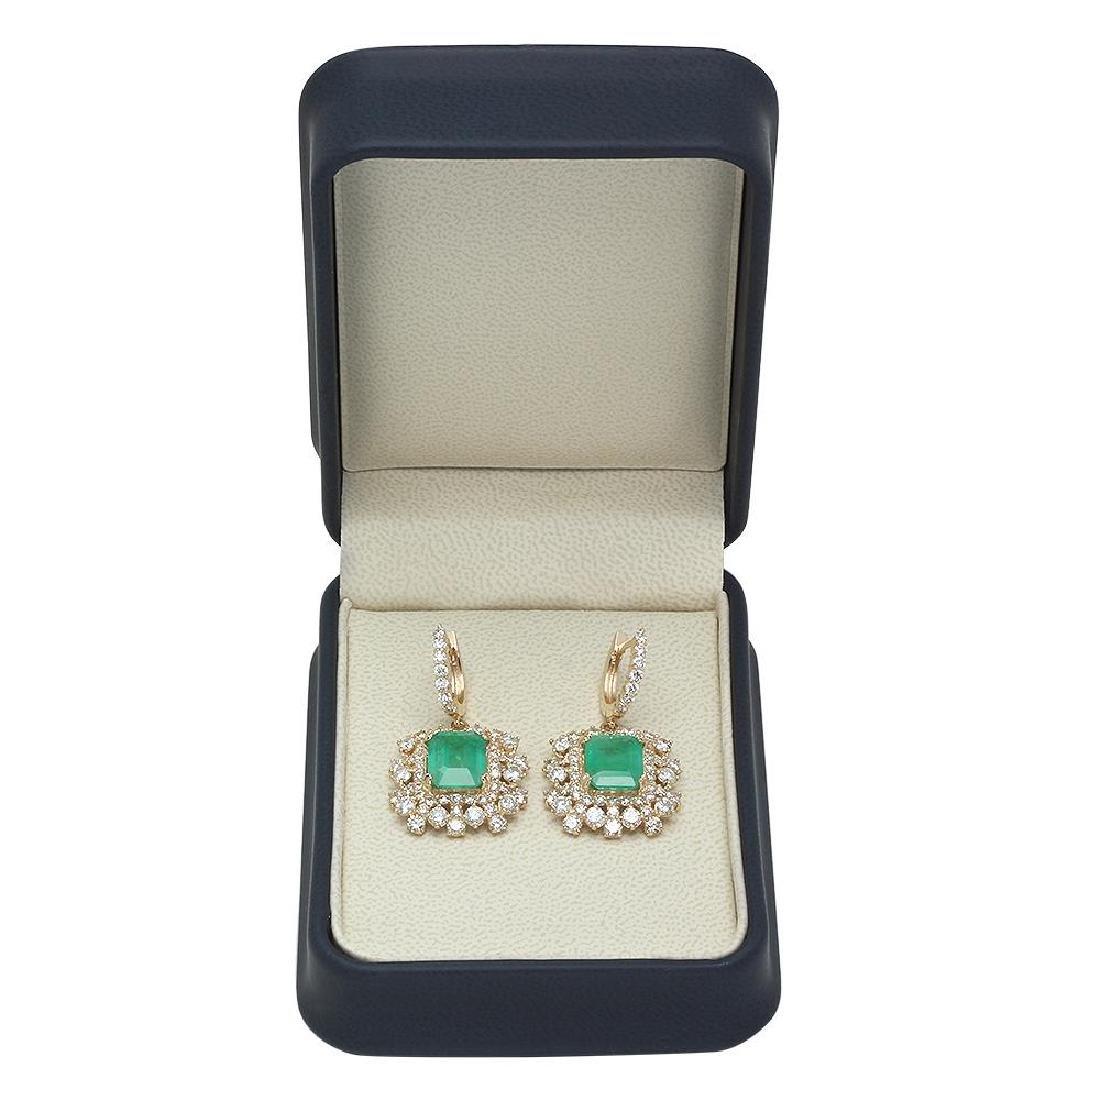 14K Gold 6.28ct Emerald 5.84ct Diamond Earrings - 3